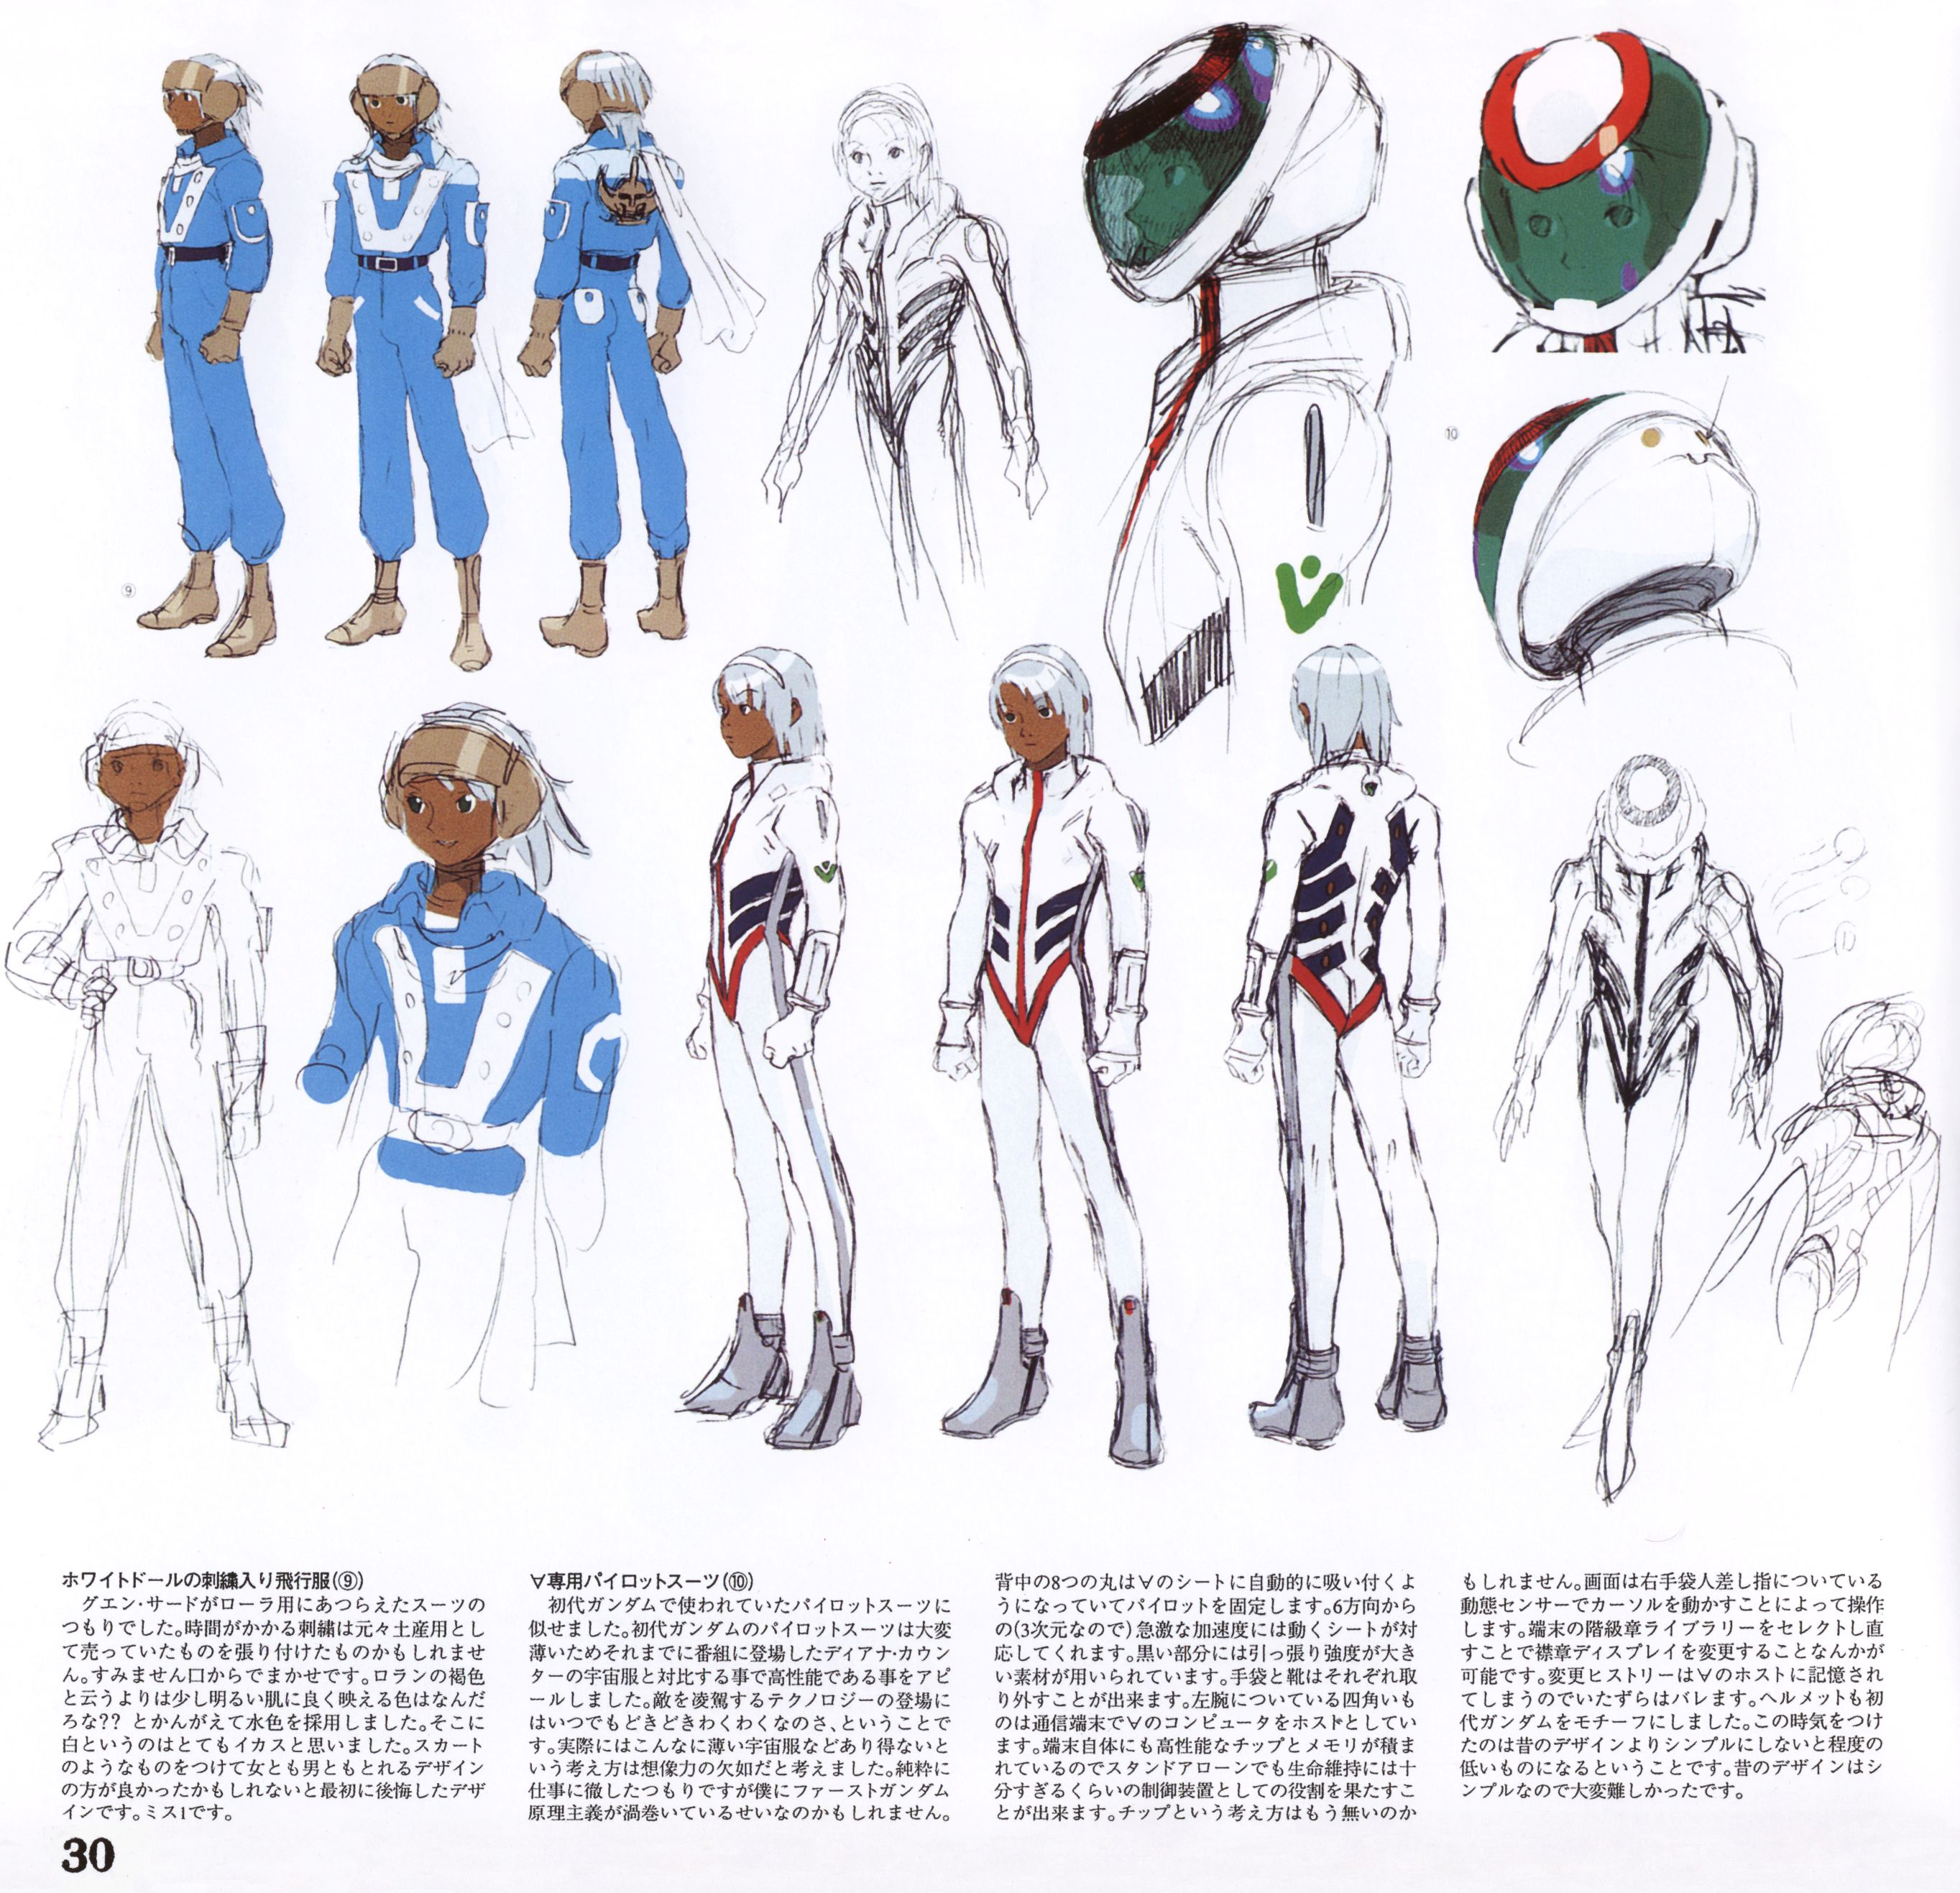 Character Design Artbook : Image loran design turn a artbook g gundam wiki